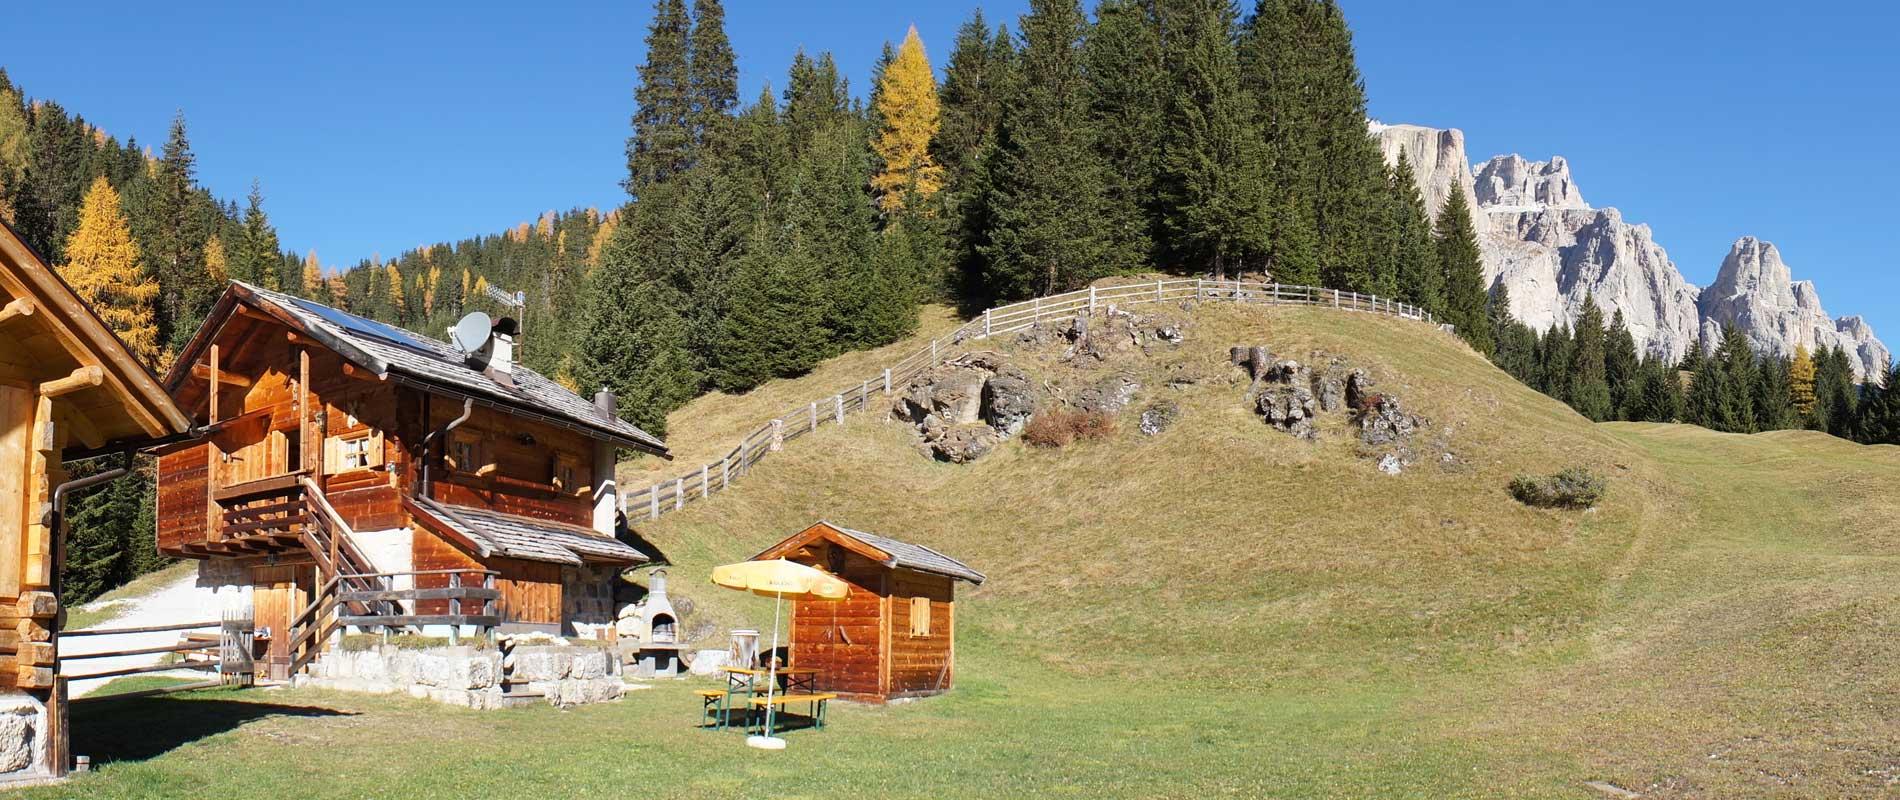 Baita pradel baita di montagna affittasi per ferie a canazei for Rifugio in baita di montagna